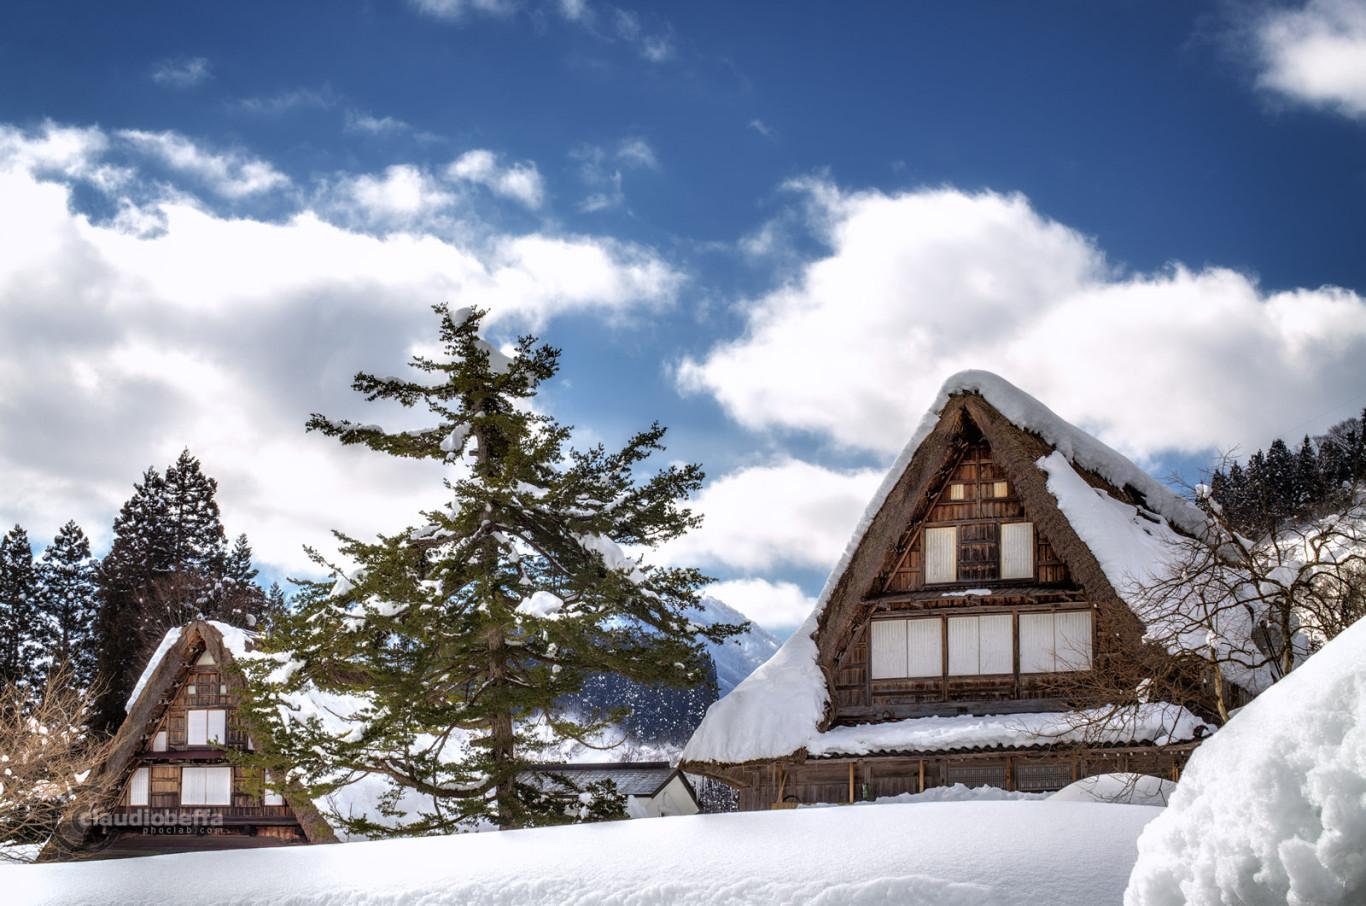 Snow, Ainokura, Gassho, Farmhouse, Landscape, Mountain, Sky, Clouds, Gokayama, Toyama, Winter, HDR, Pentax, Japan